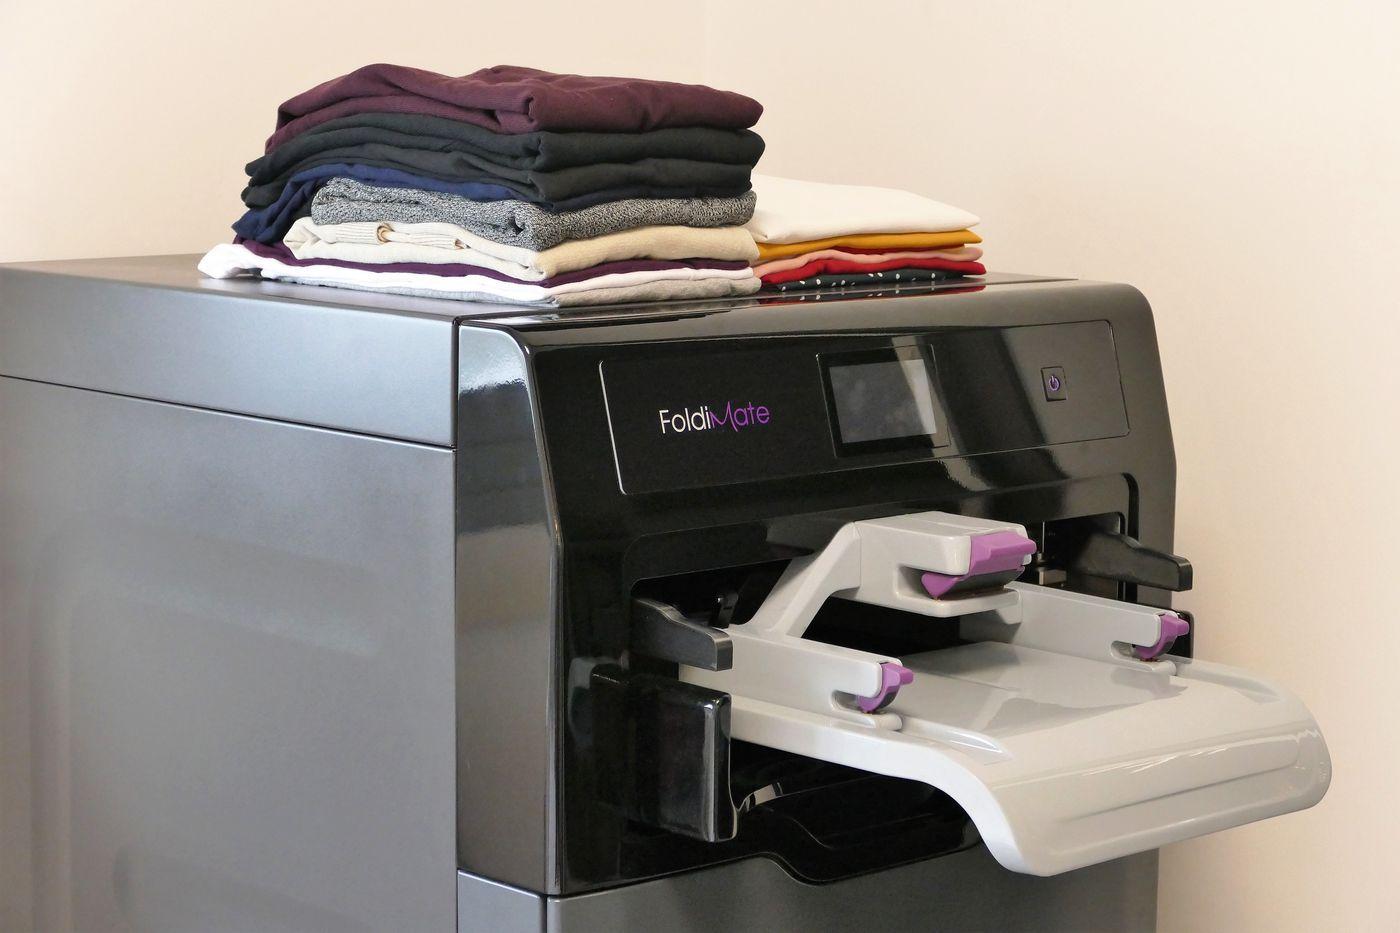 Foldimate S Laundry Folding Machine Actually Works Now Home Folding Machine Folding Laundry Laundry